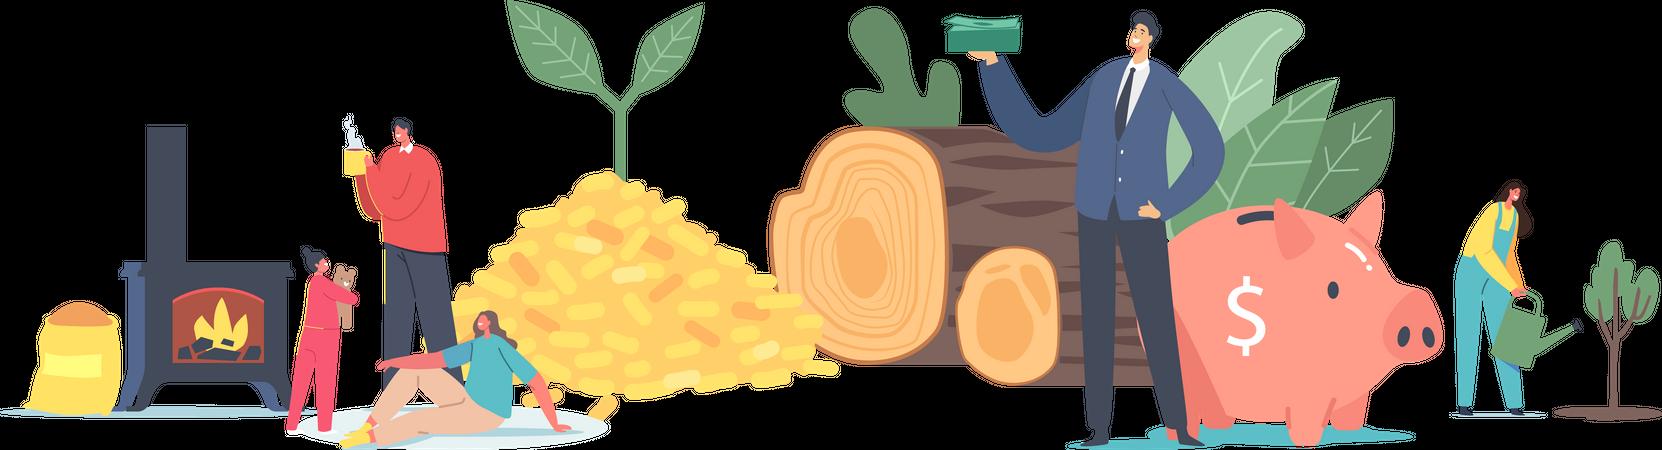 People Use Bio Coal Concept Illustration